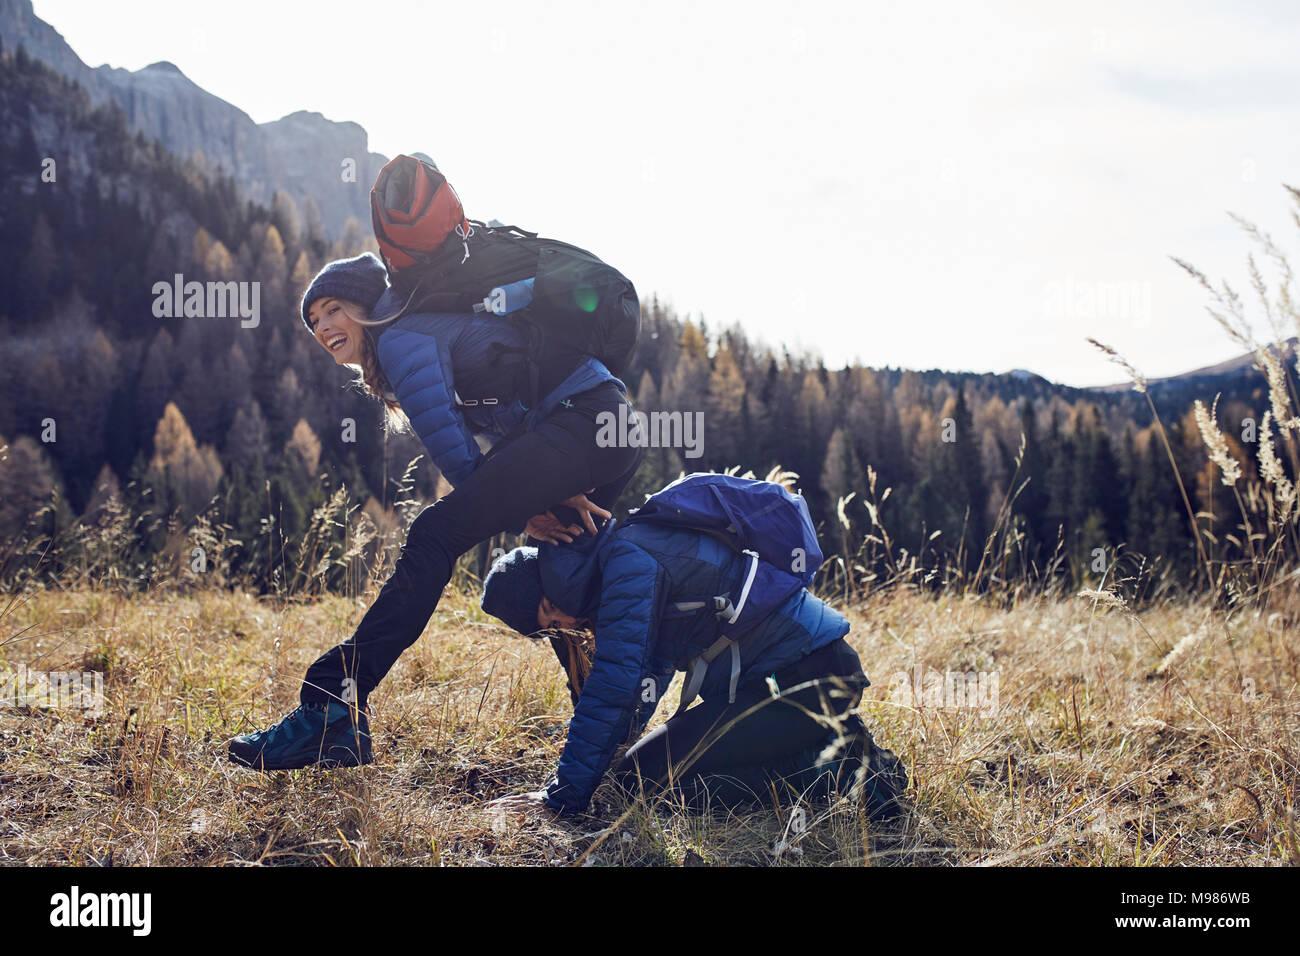 Zwei verspielte junge Frauen wandern in den Bergen Stockbild